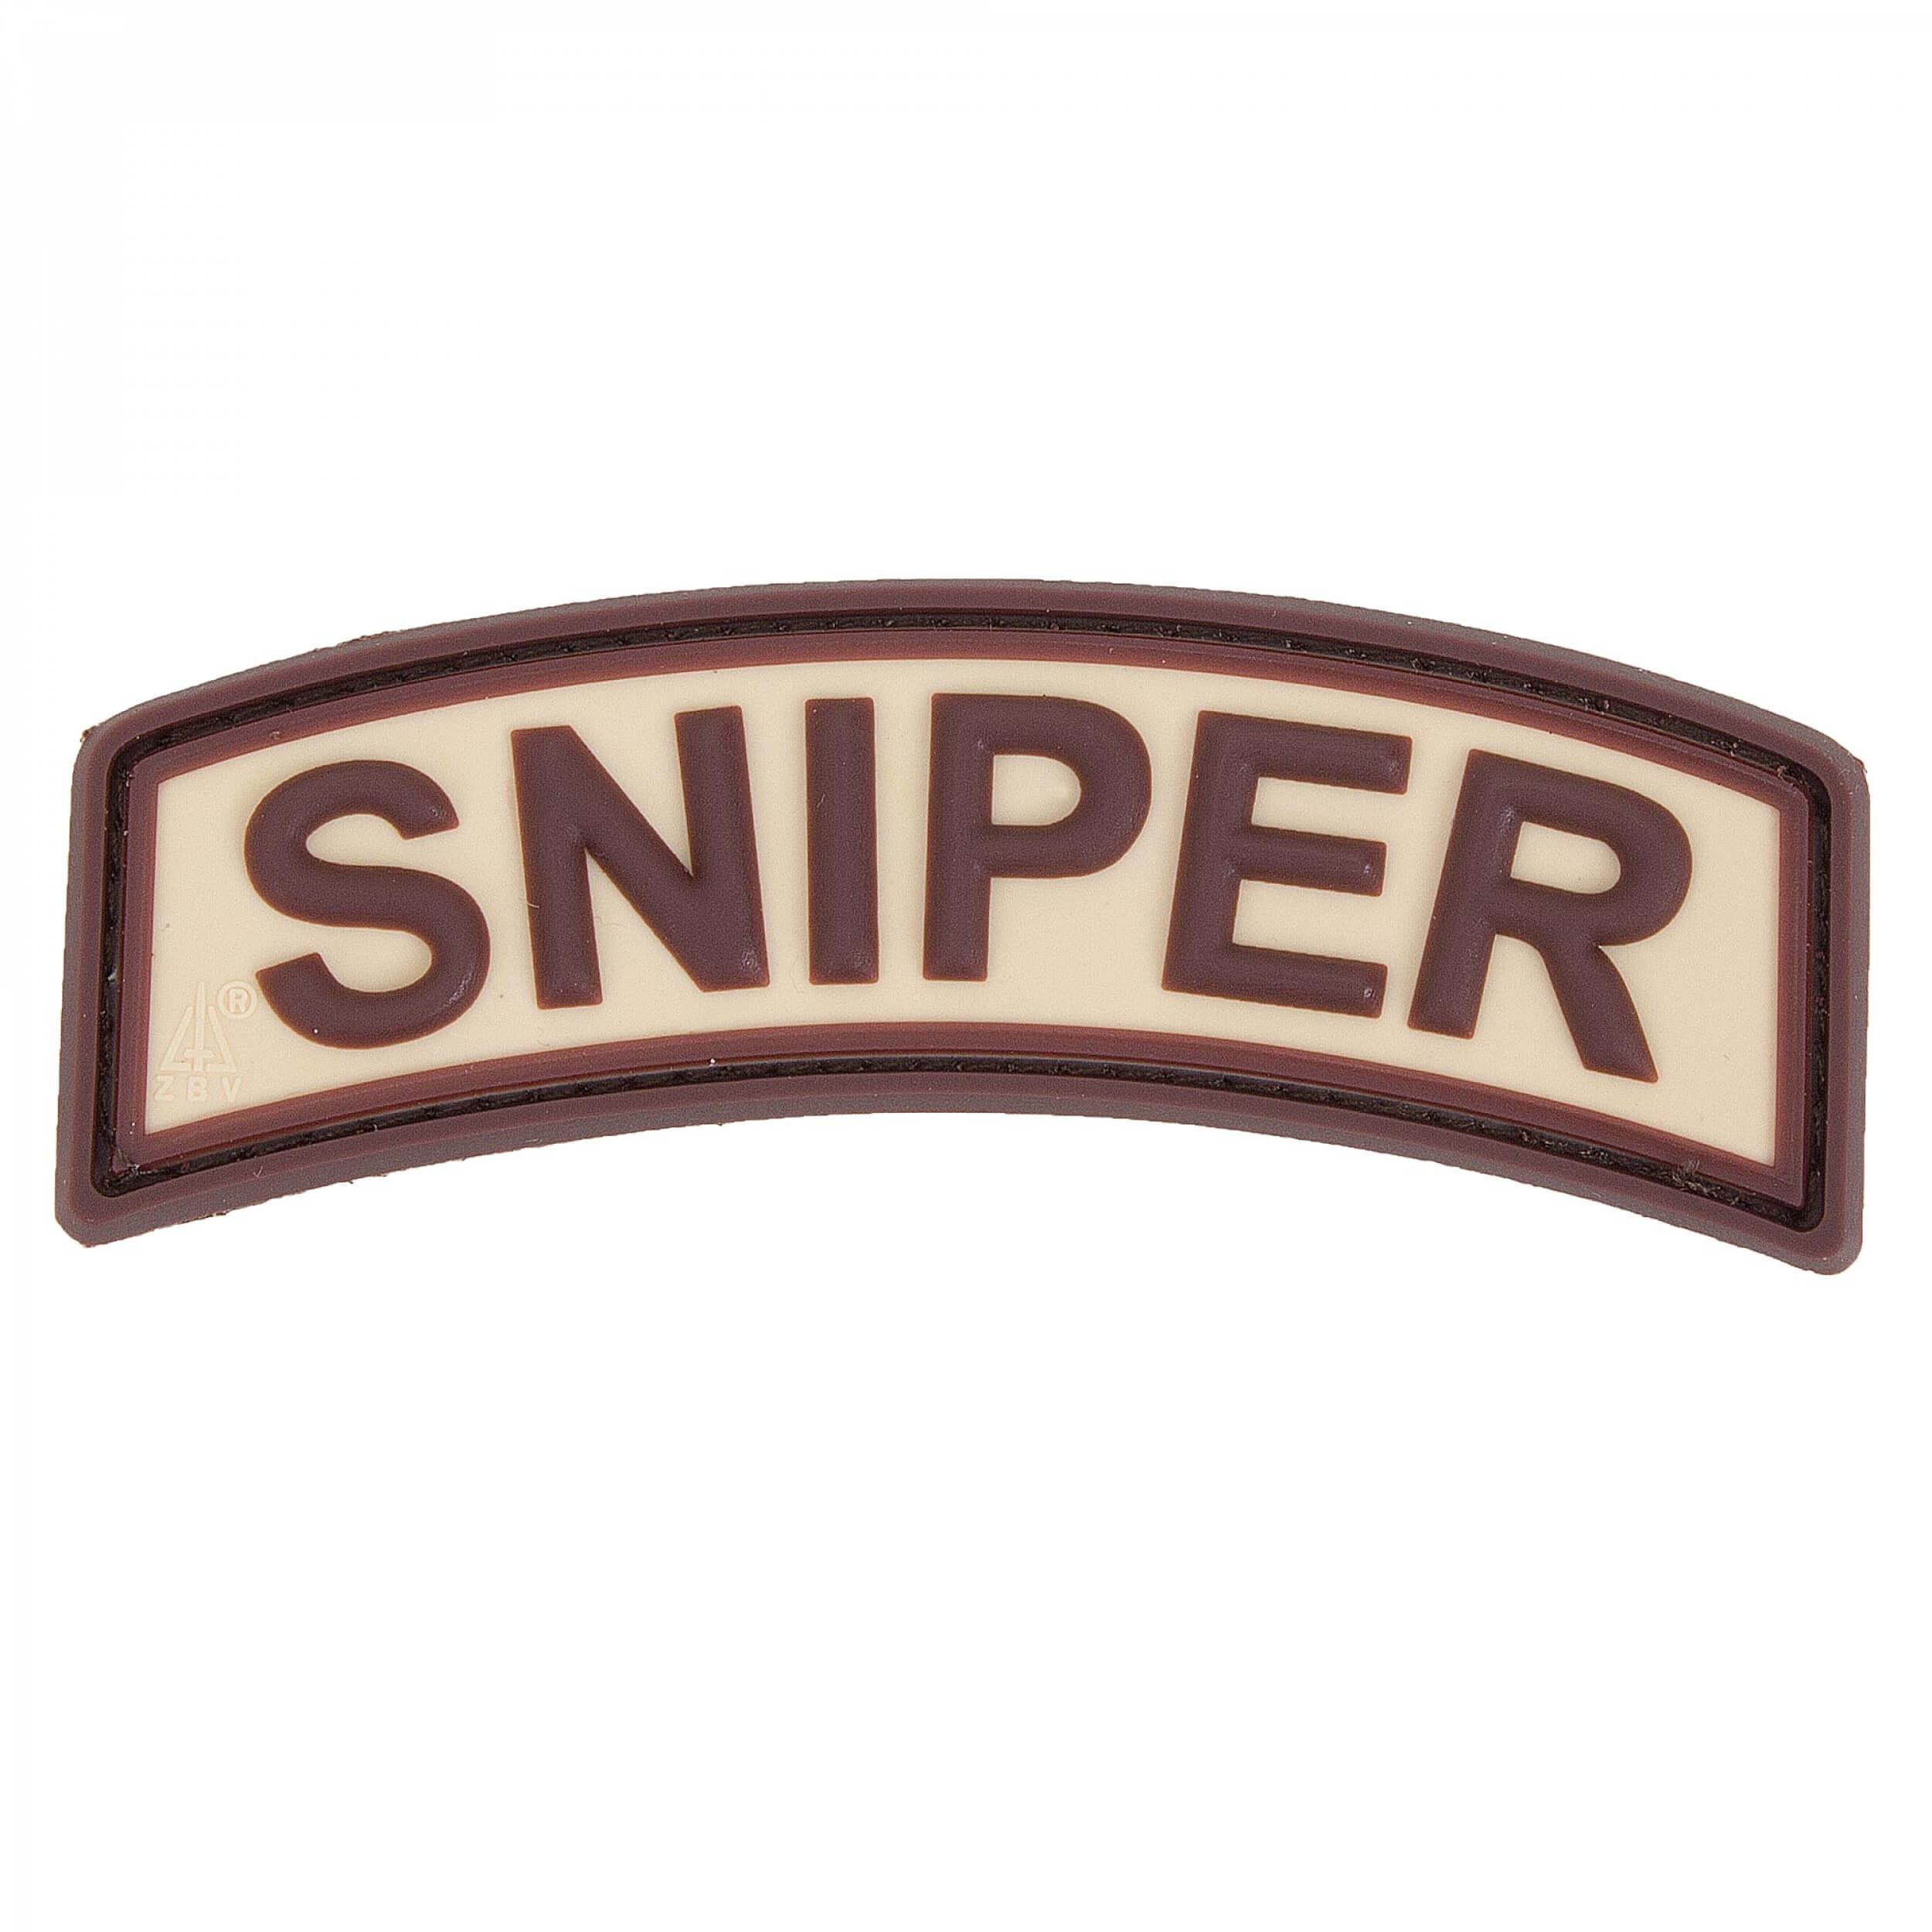 JTG Sniper Tab Patch, desert / 3D Rubber Patch